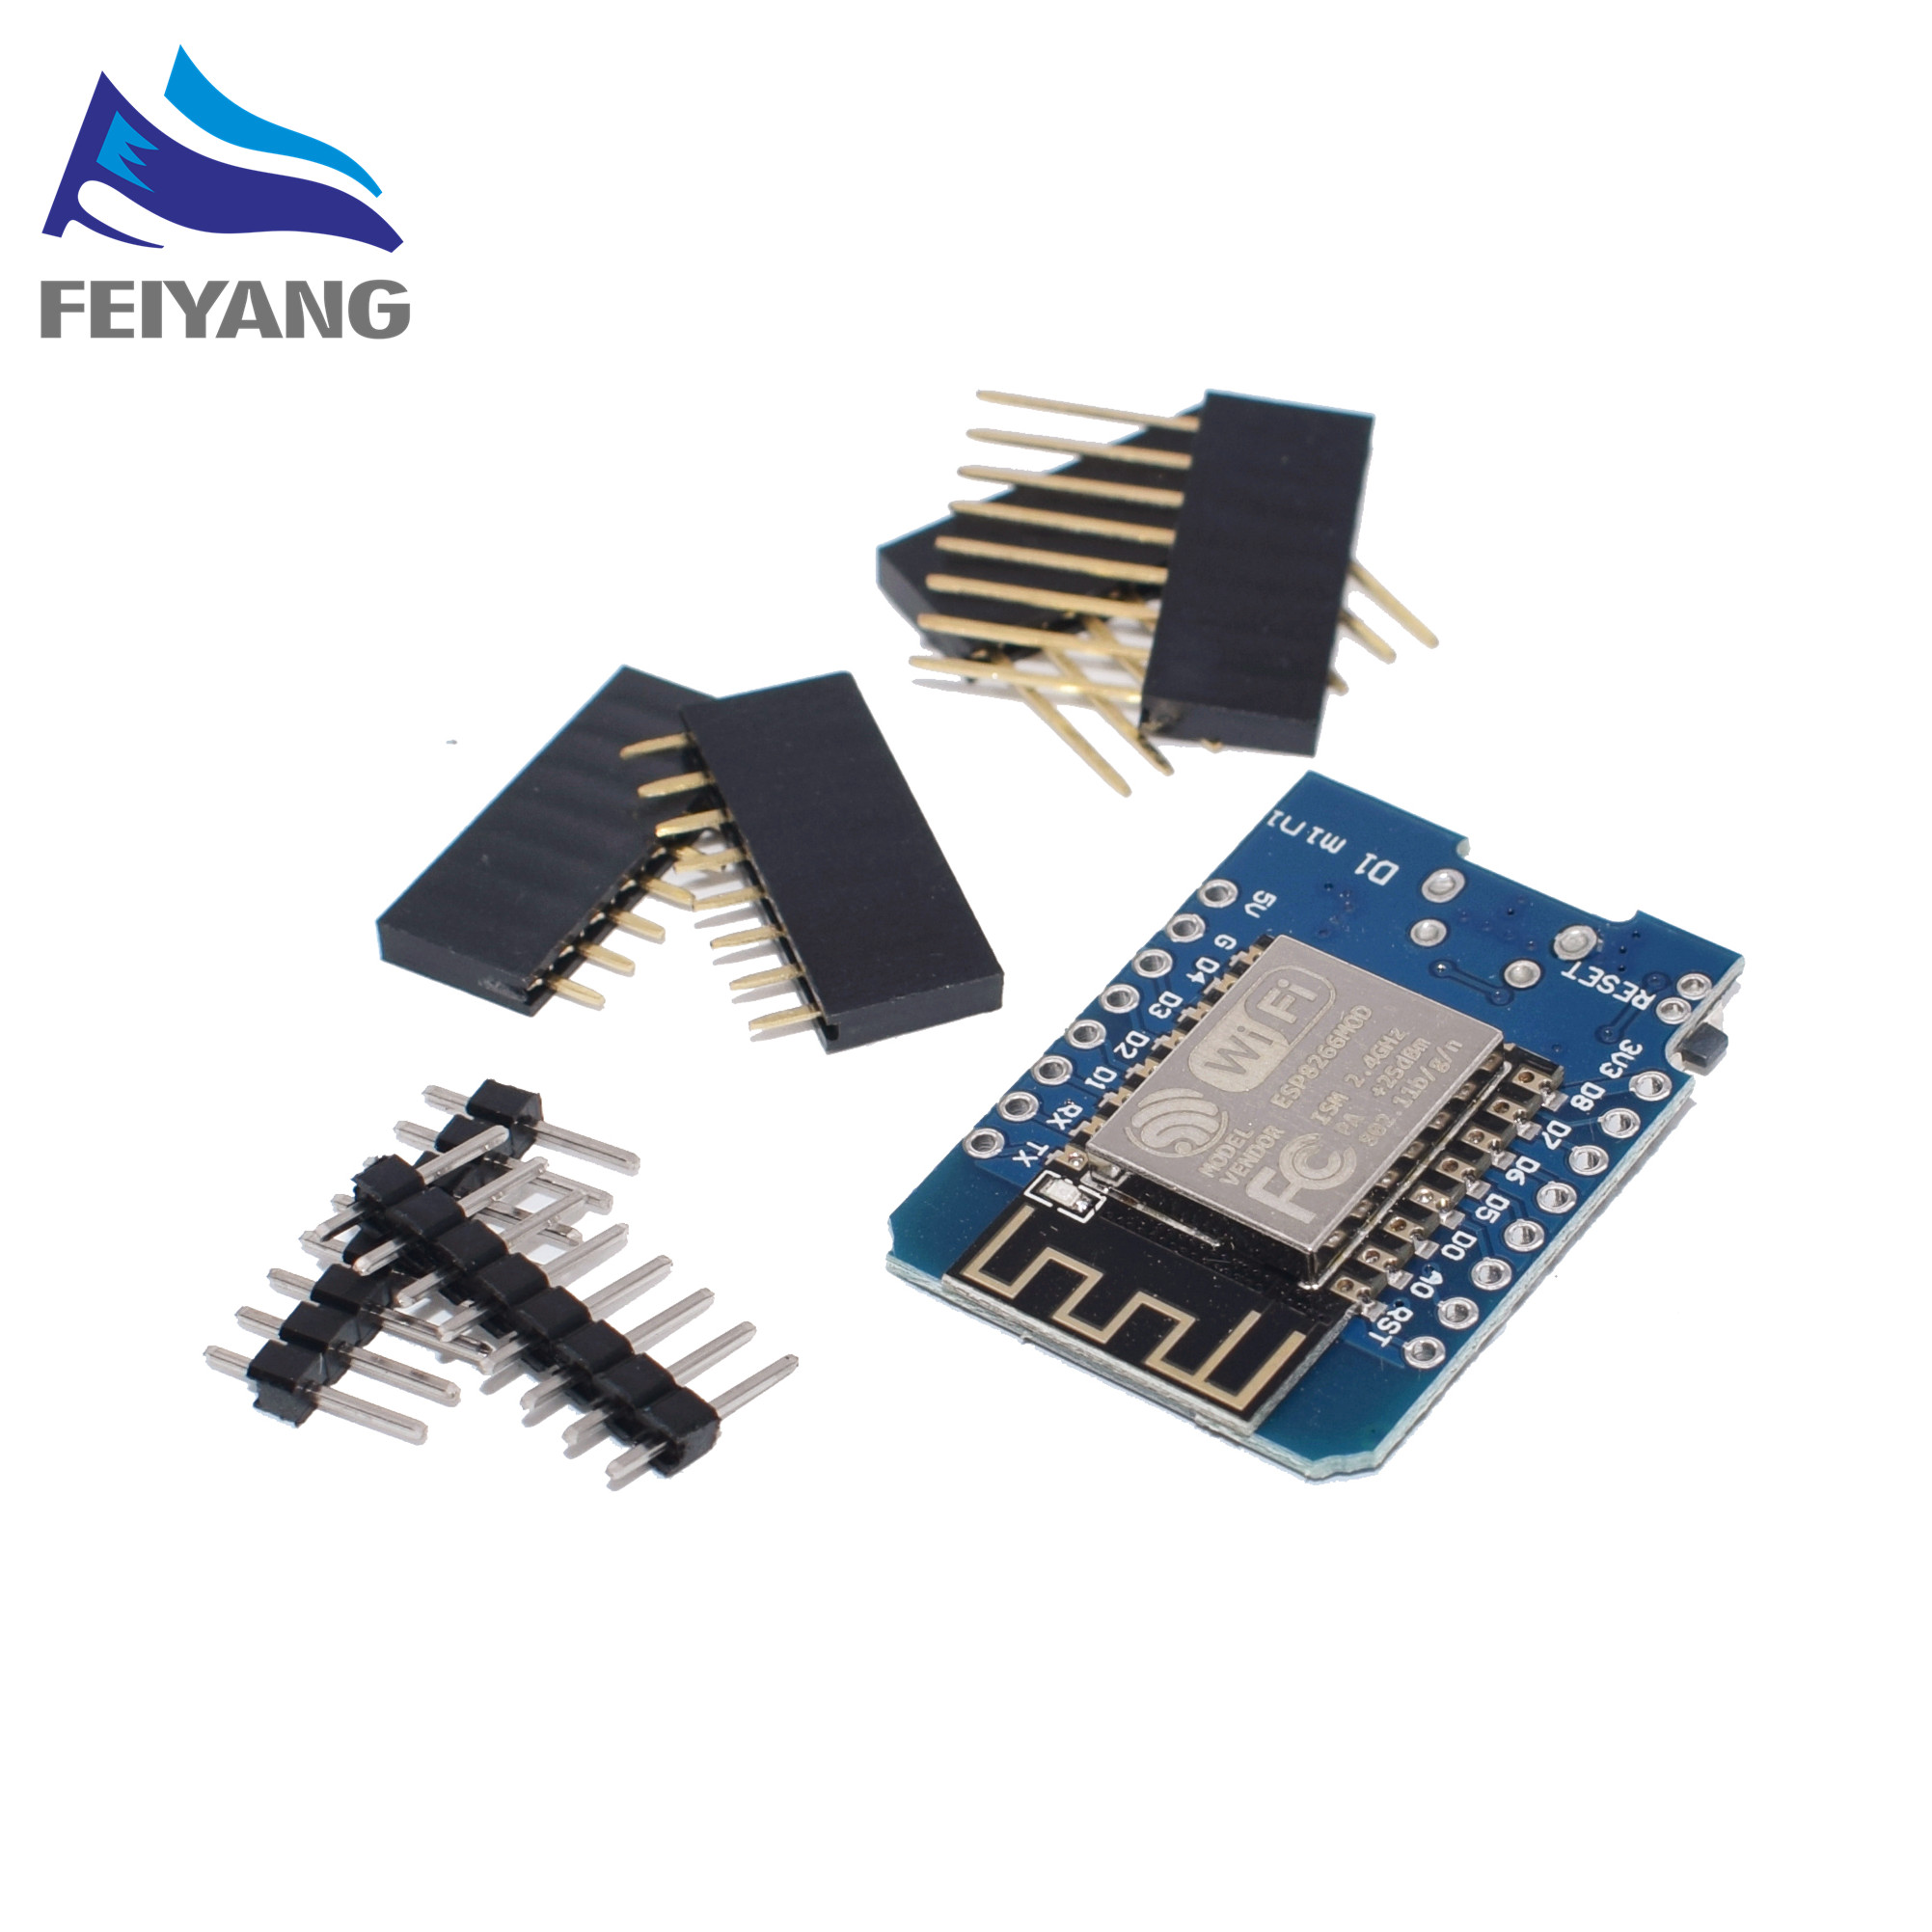 3,3 V Relais Schild für Arduino WeMos D1 Mini ESP8266 Entwicklungsboard Digital